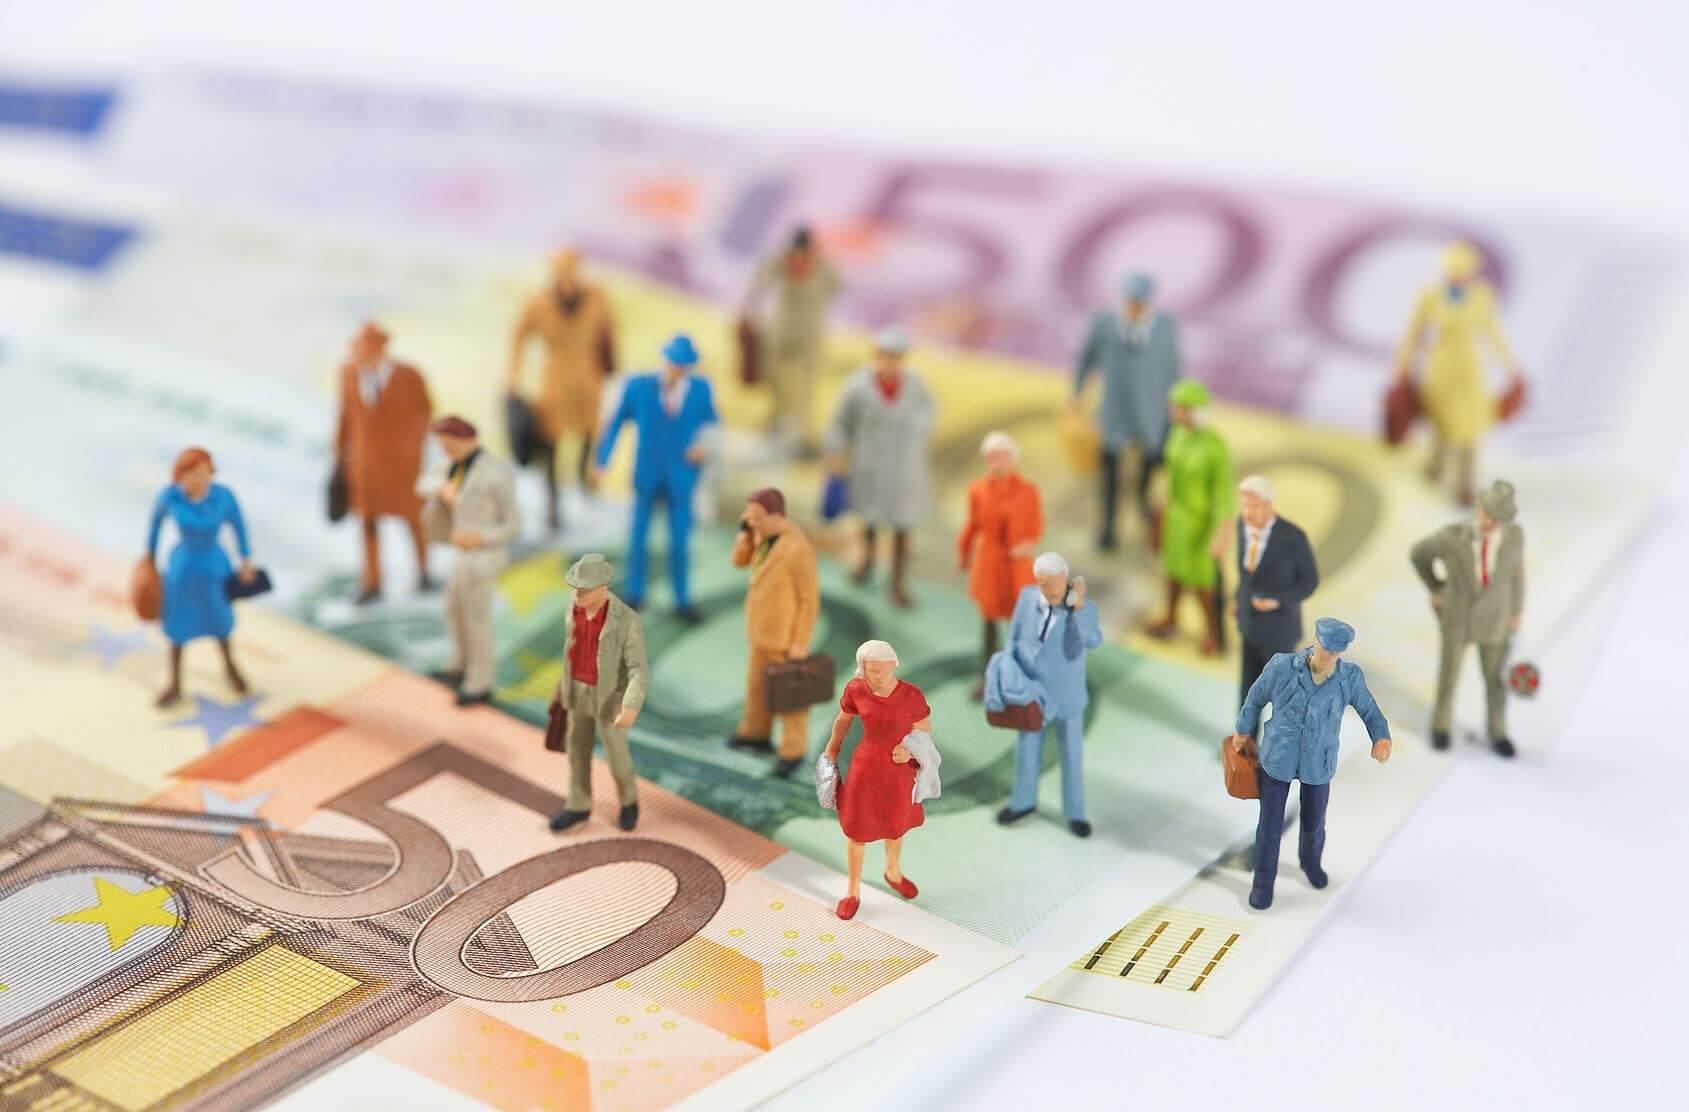 Makro ekonomi nedir? Makroekonomi ne demek?